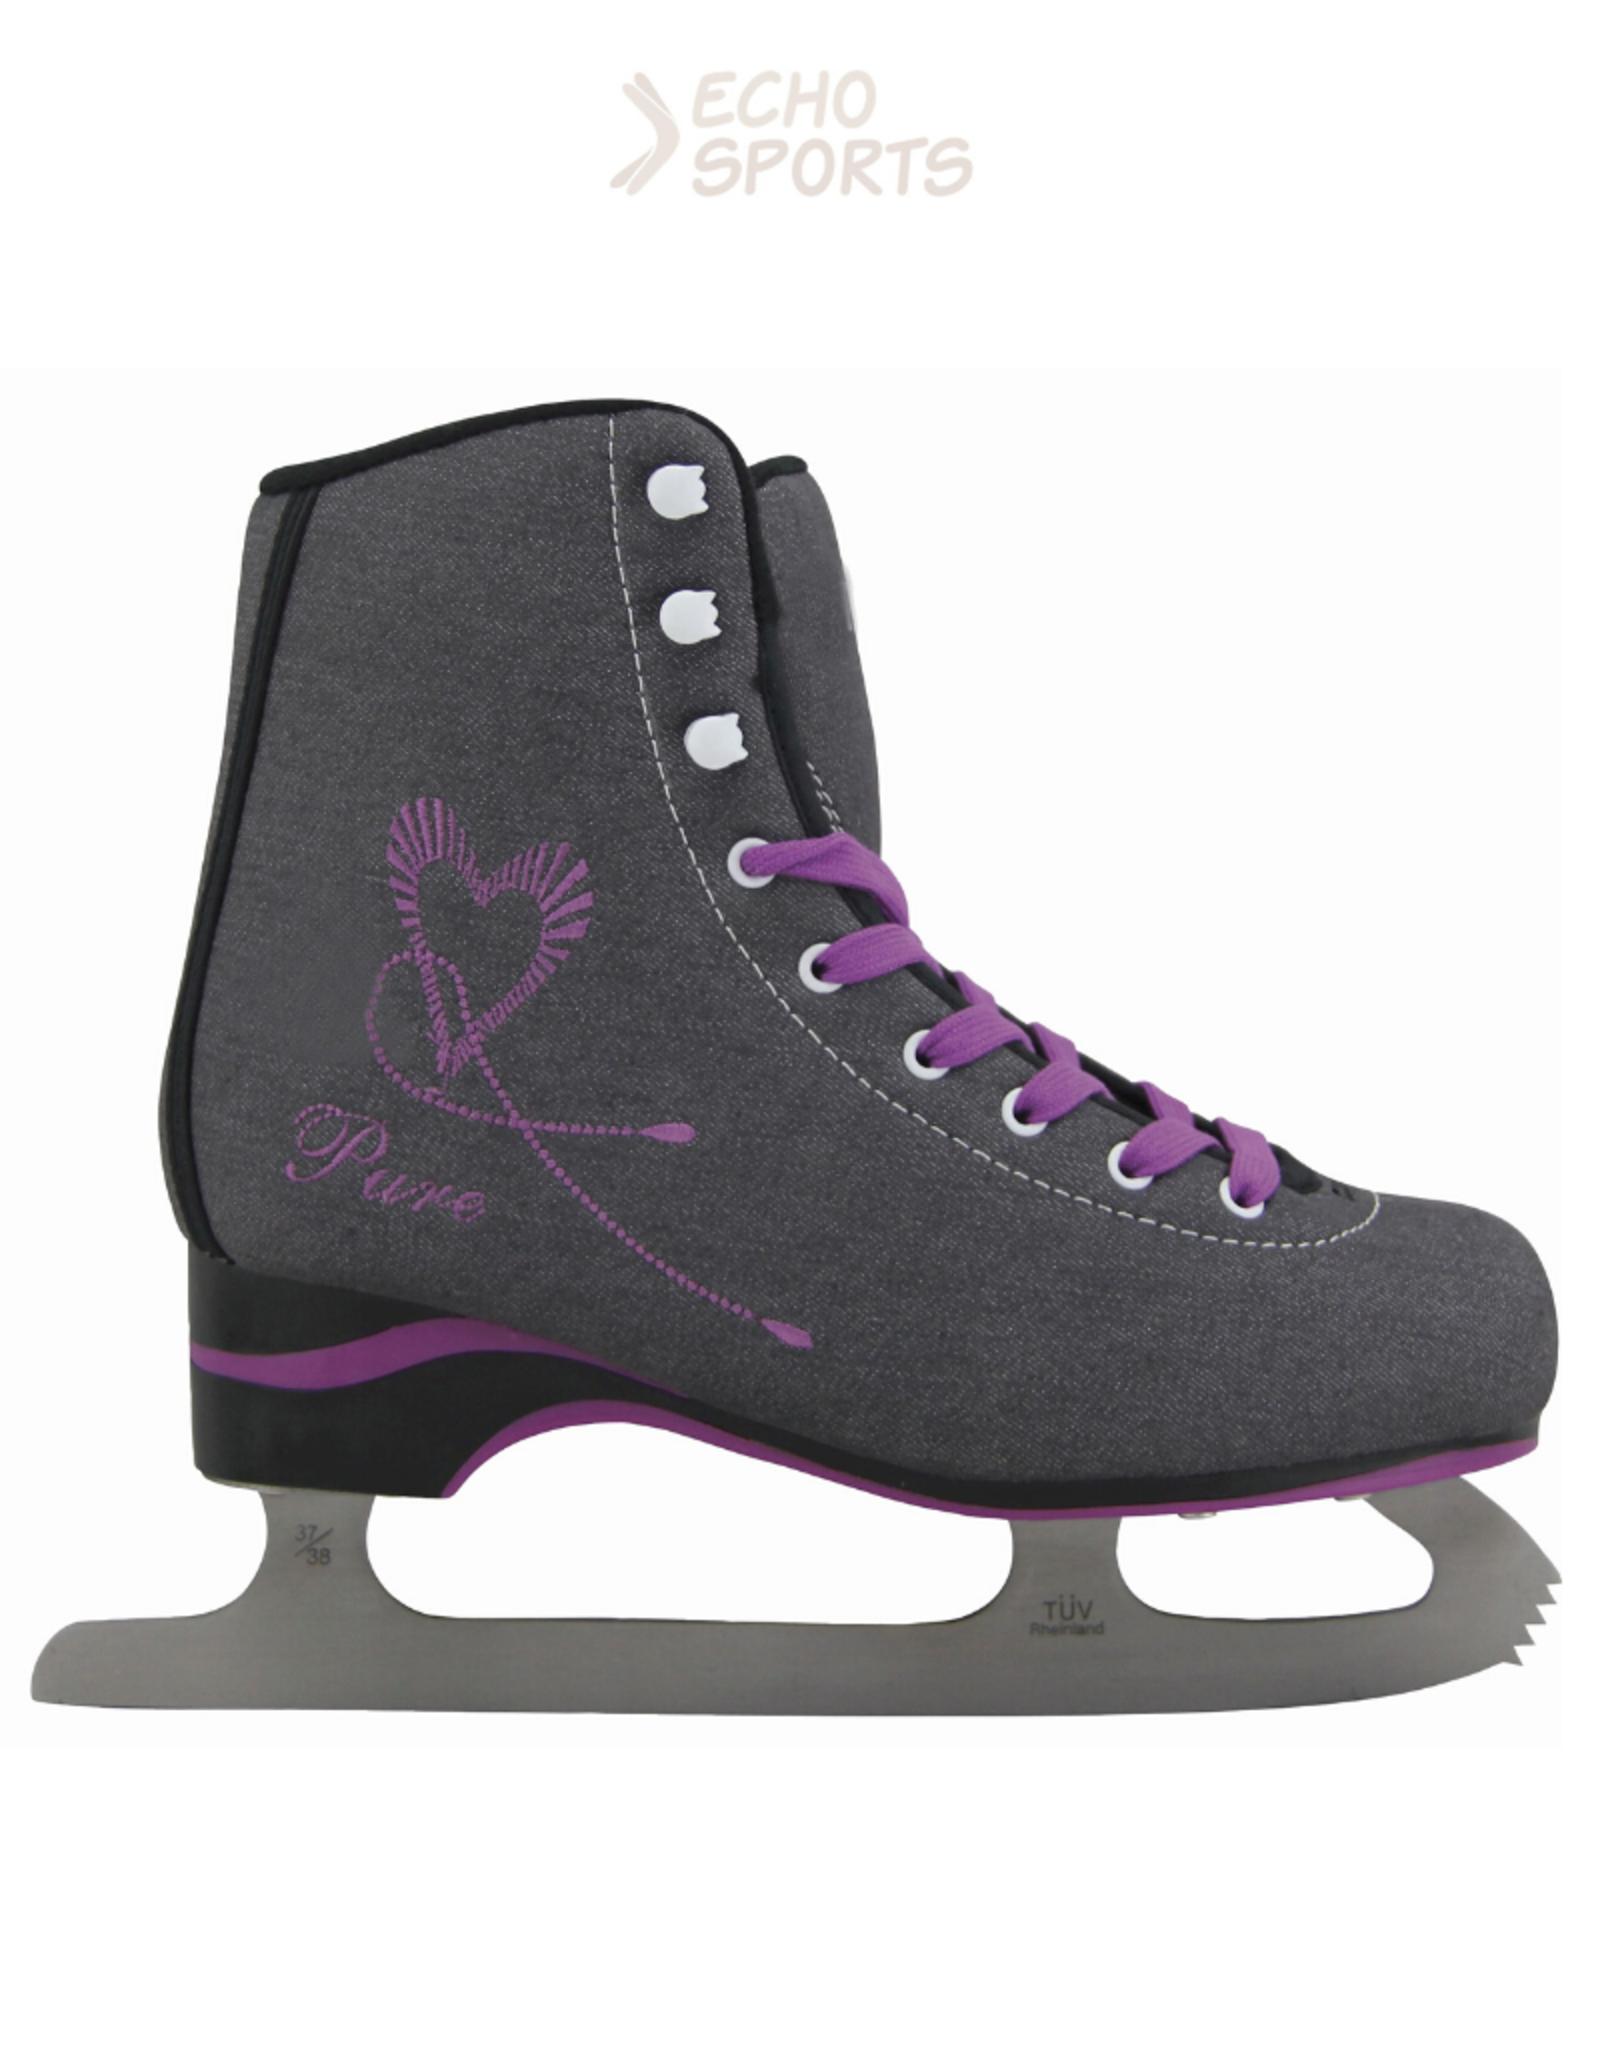 Leisure skate Softmax  S-736 women